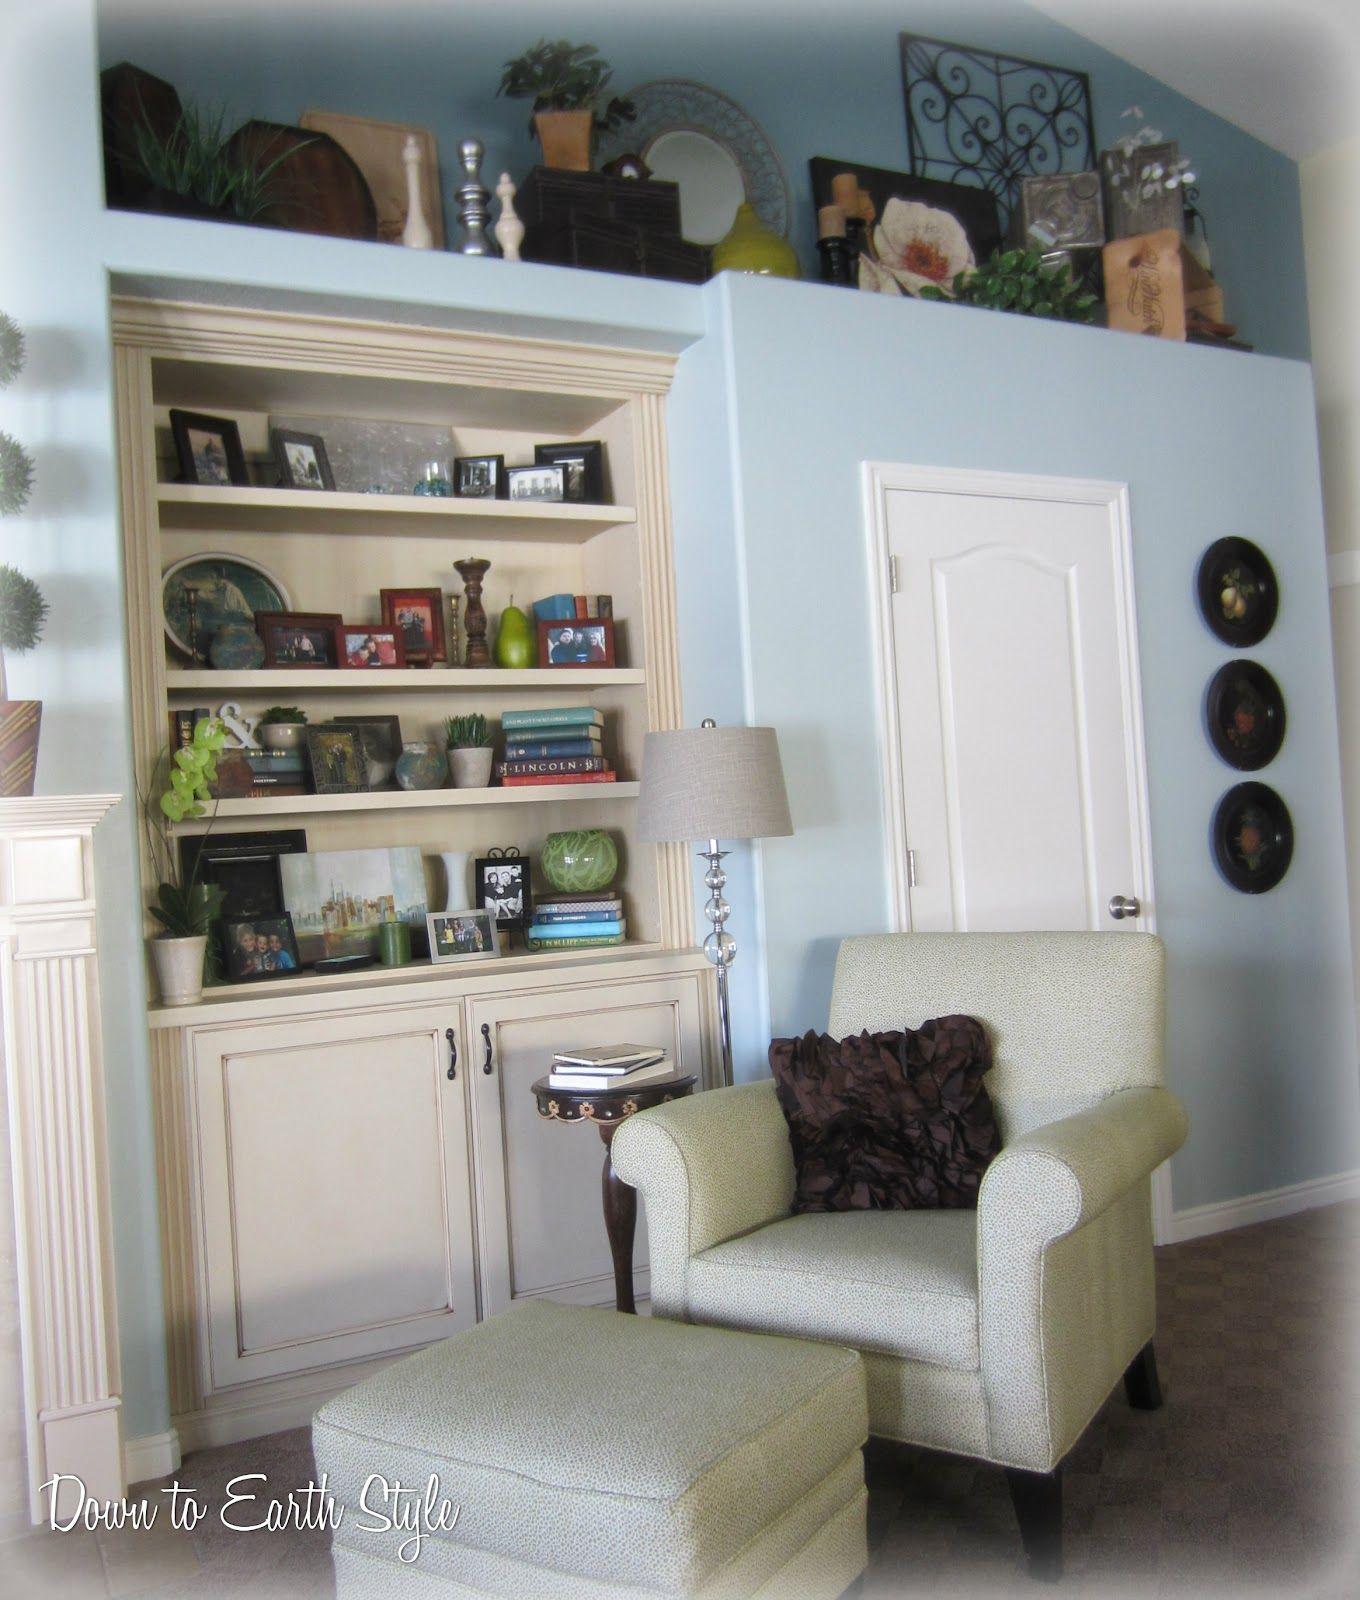 Kitchen Plant Shelf Decorating Ideas: Restoration Hardware Meets Beach House